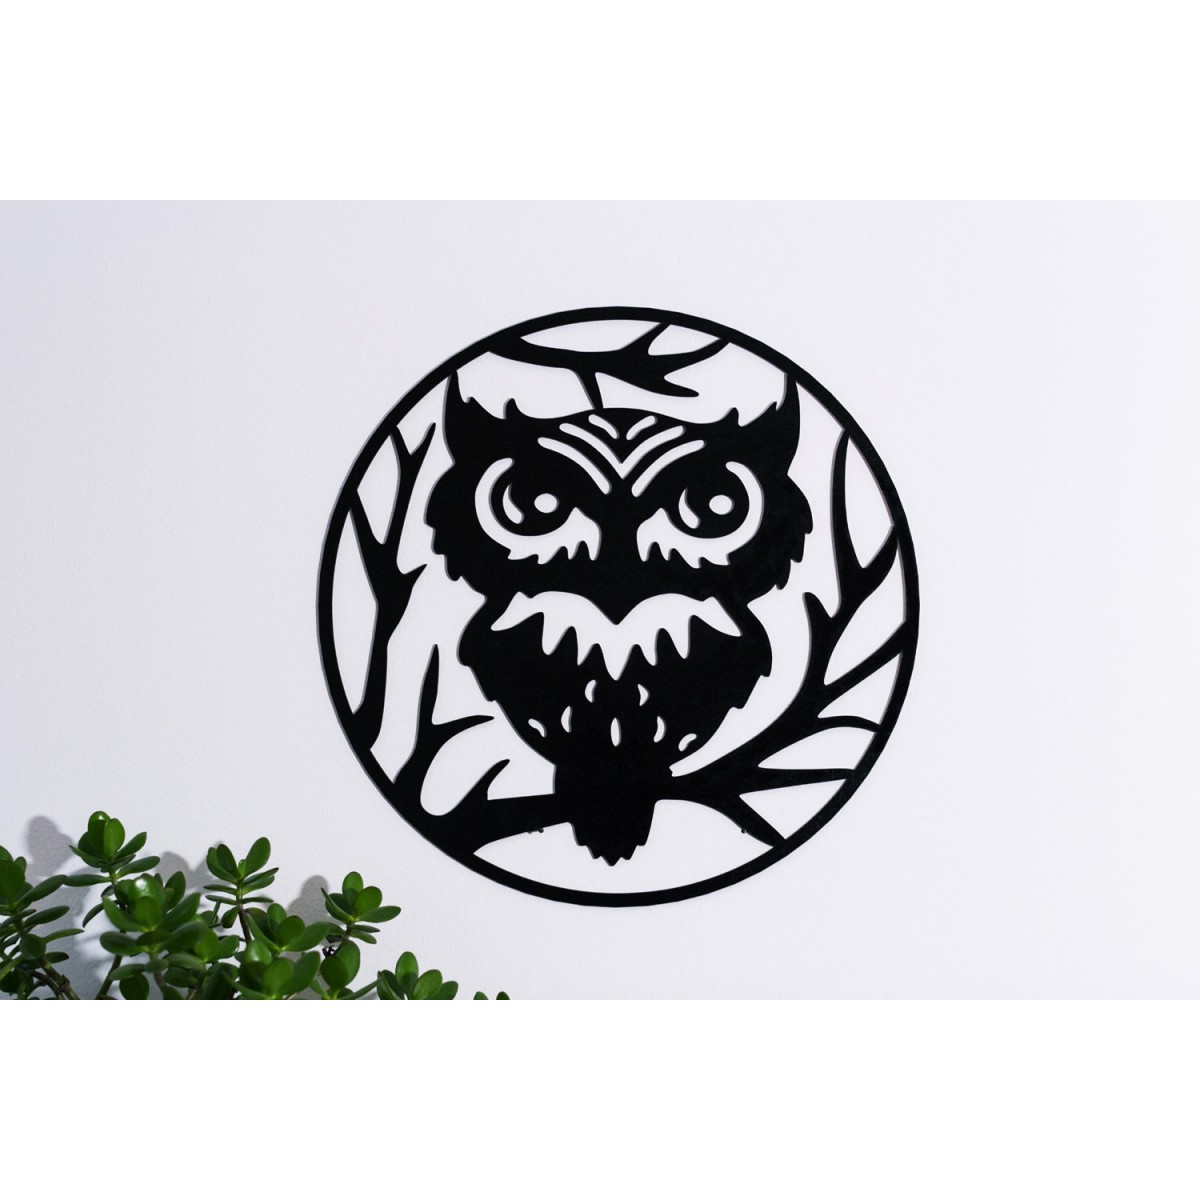 Wanddeko OWL, 45cm